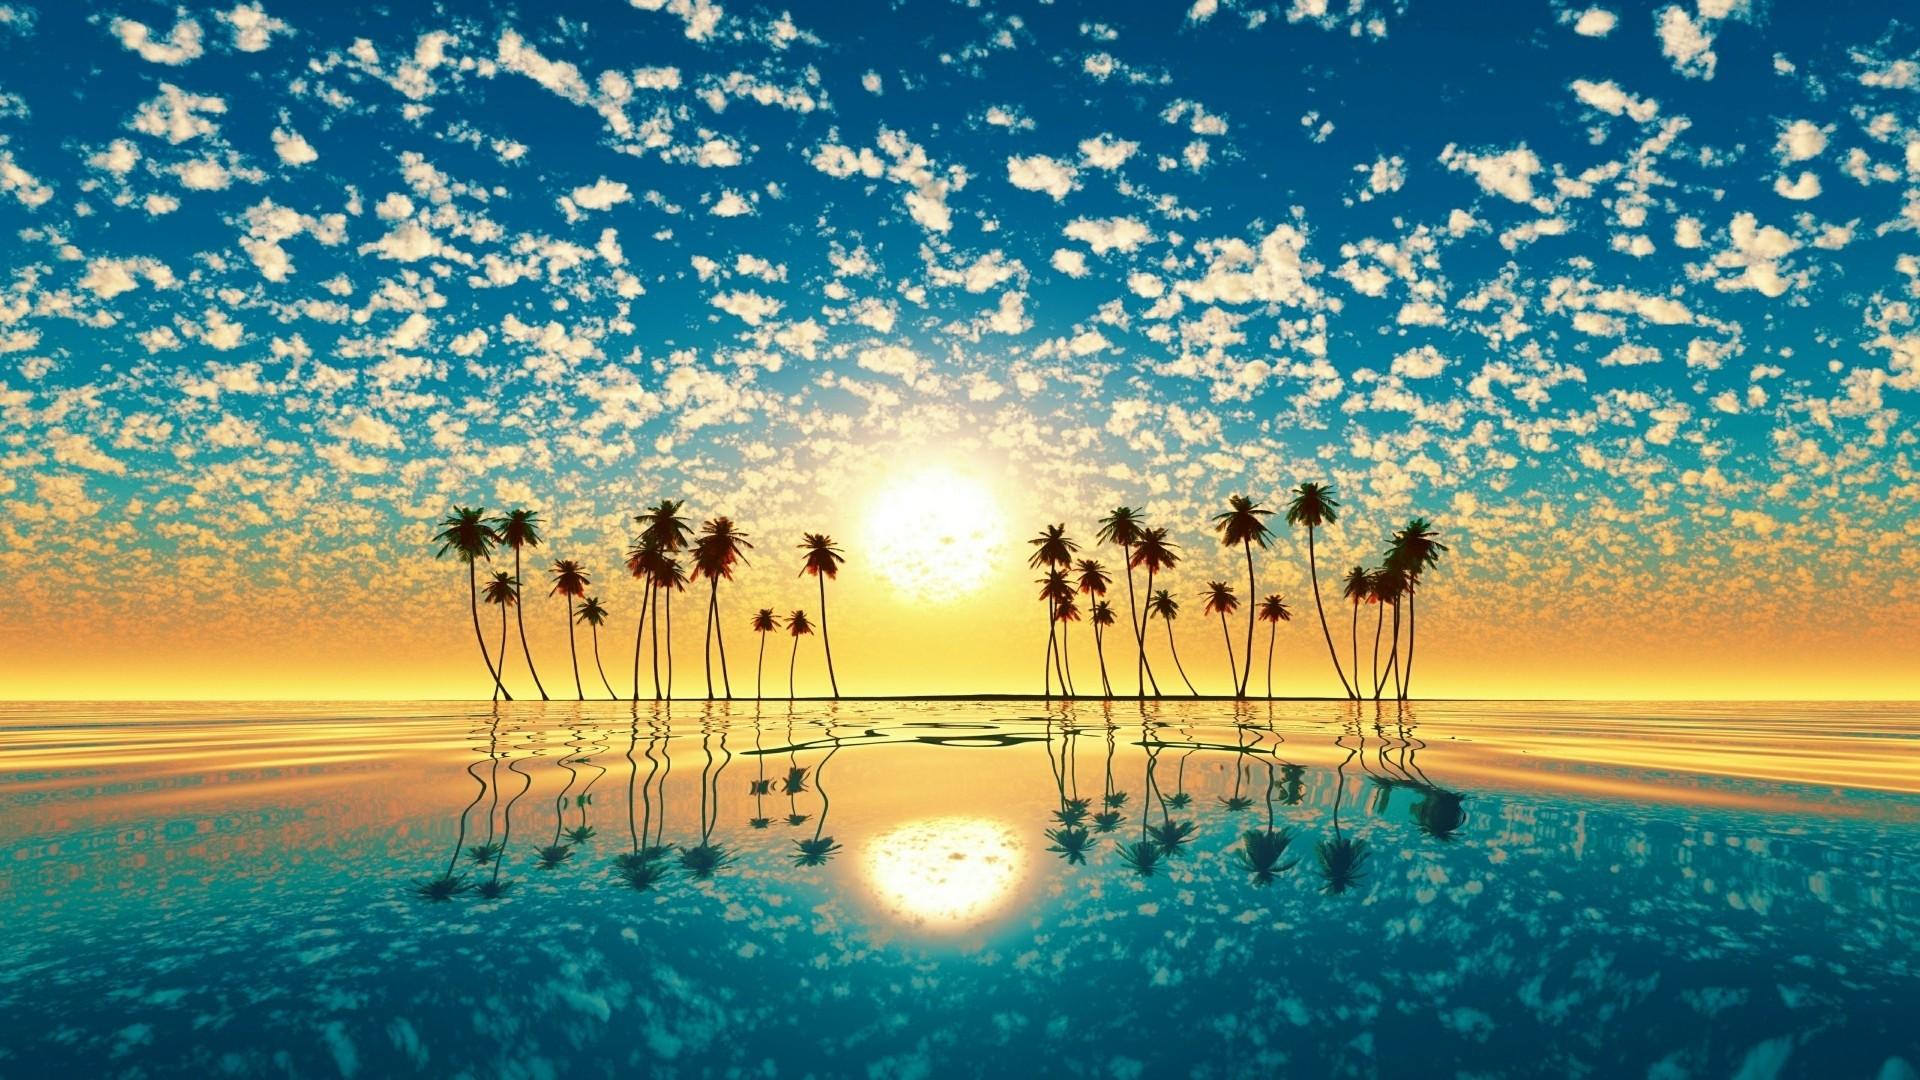 Sun Free Wallpaper